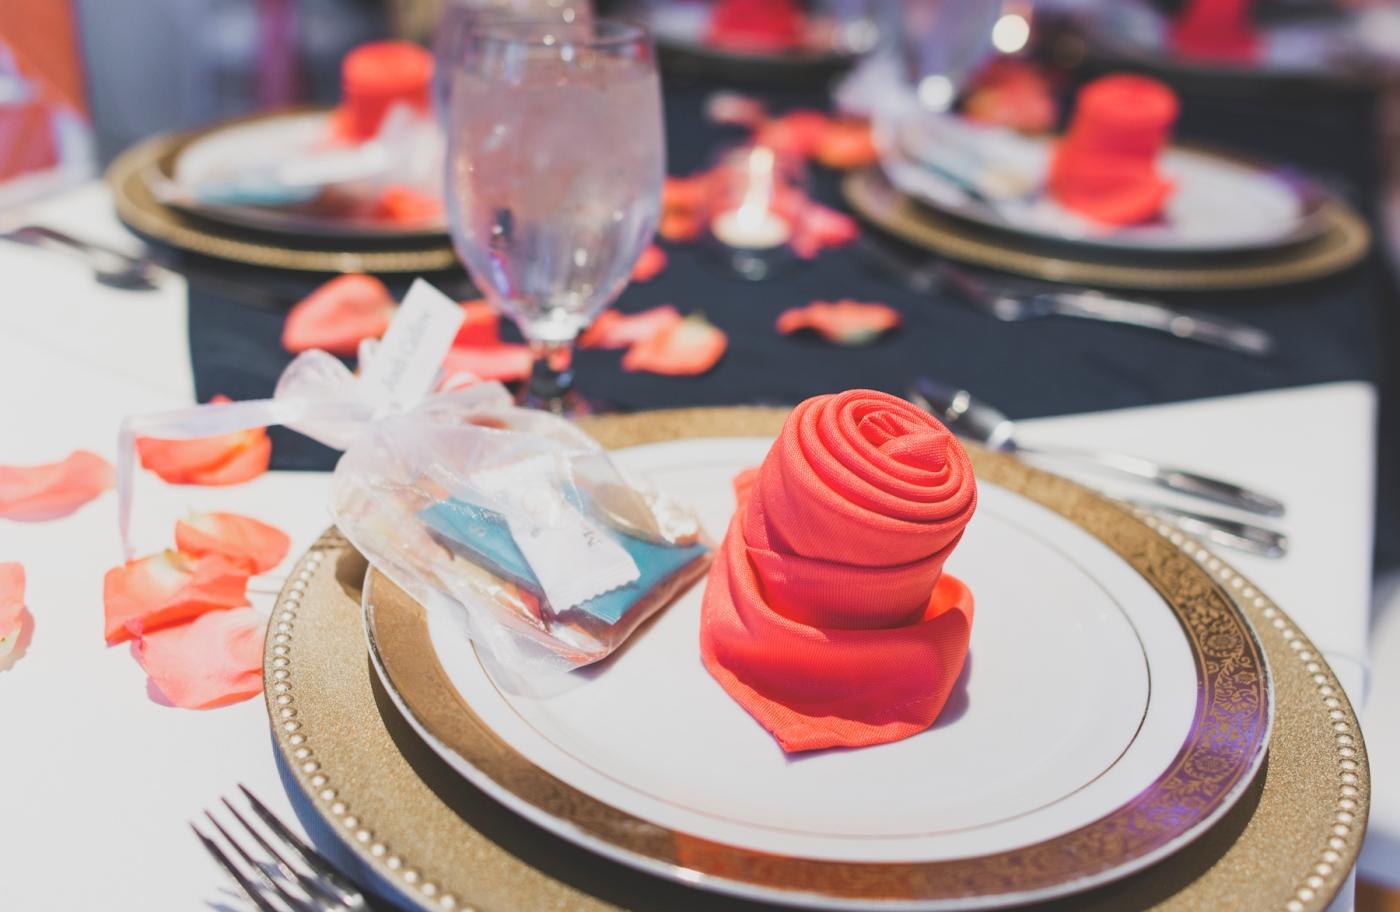 DSC_3079Everett_Wedding_Ballroom_Jane_Speleers_photography_Rachel_and_Edmund_cake cutting_2017